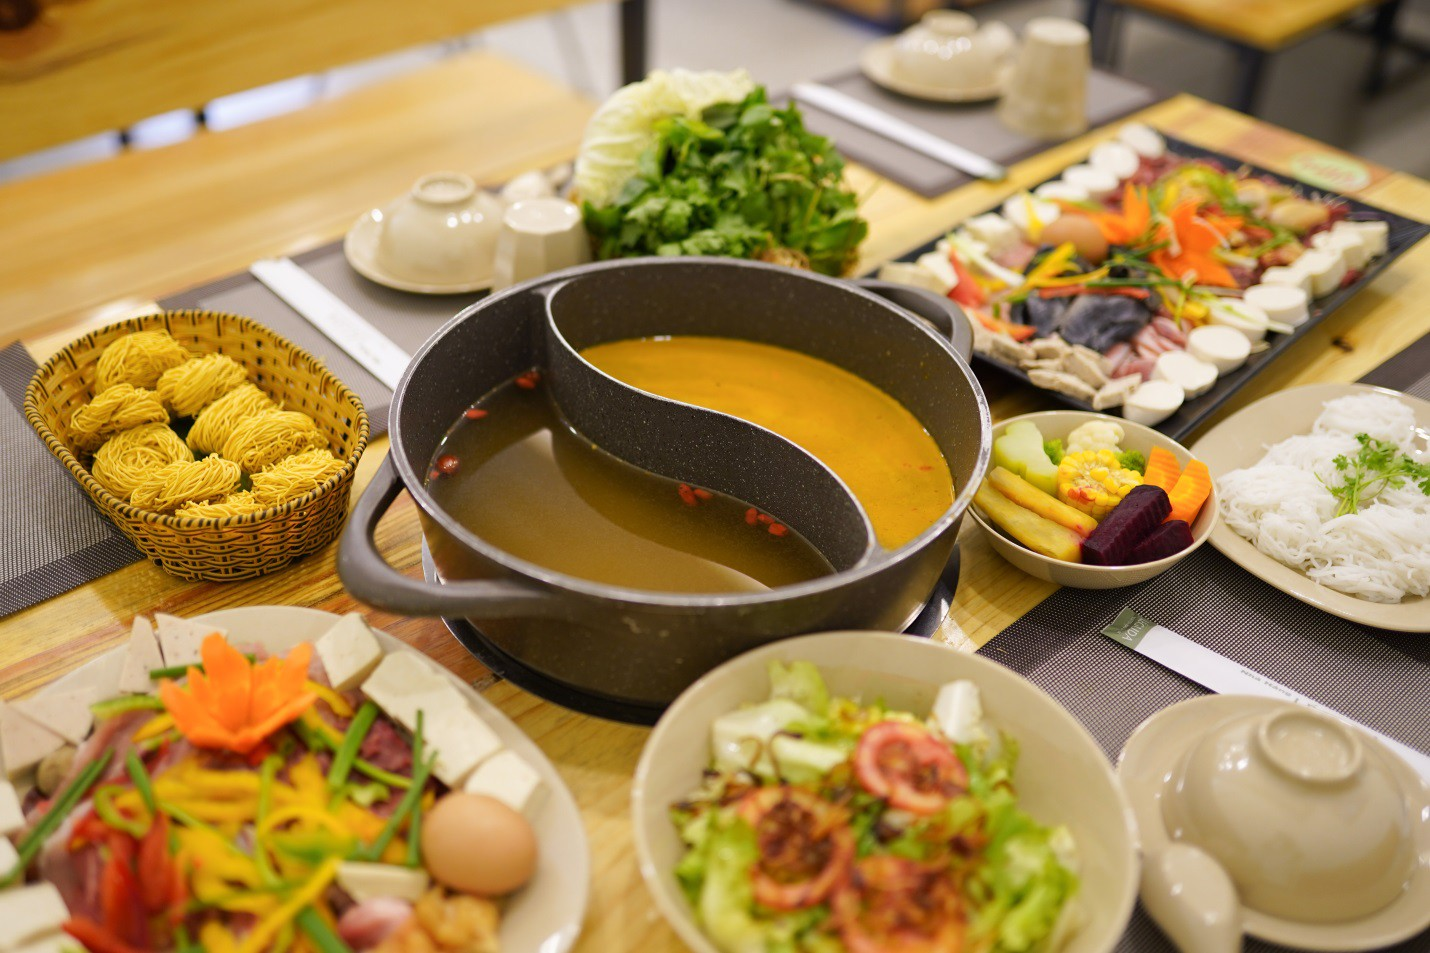 Ăn rau thả ga tại buffet rau Léguda Nha Trang - Ảnh 4.